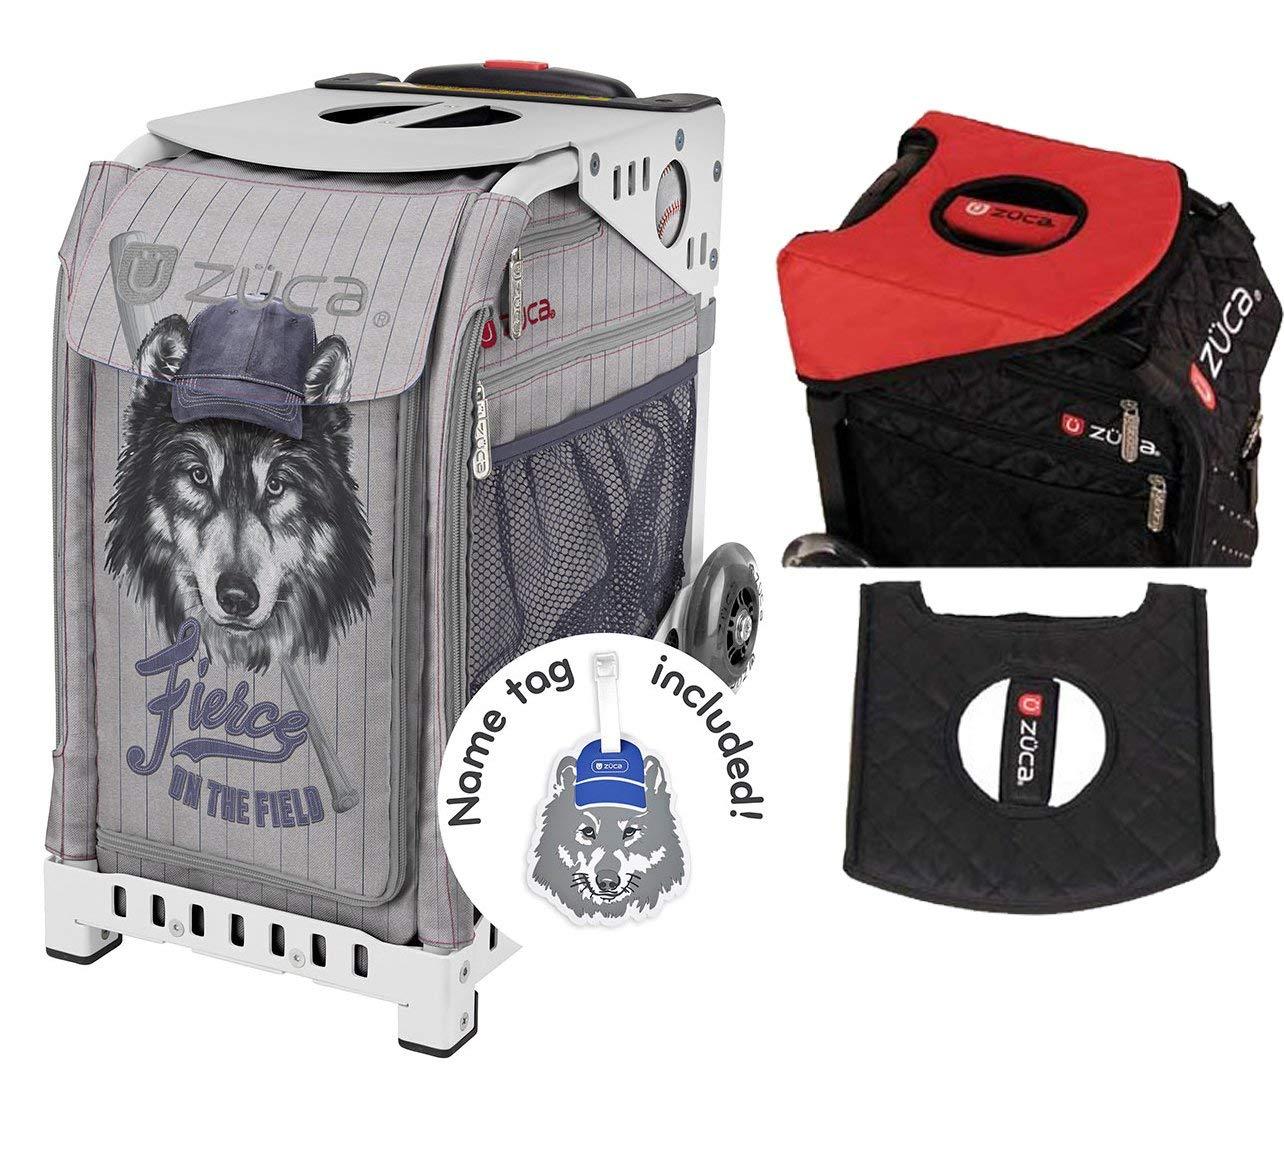 ZUCA Fierce On The Field Sport Insert Bag & White Frame + Gift Seat Cushion